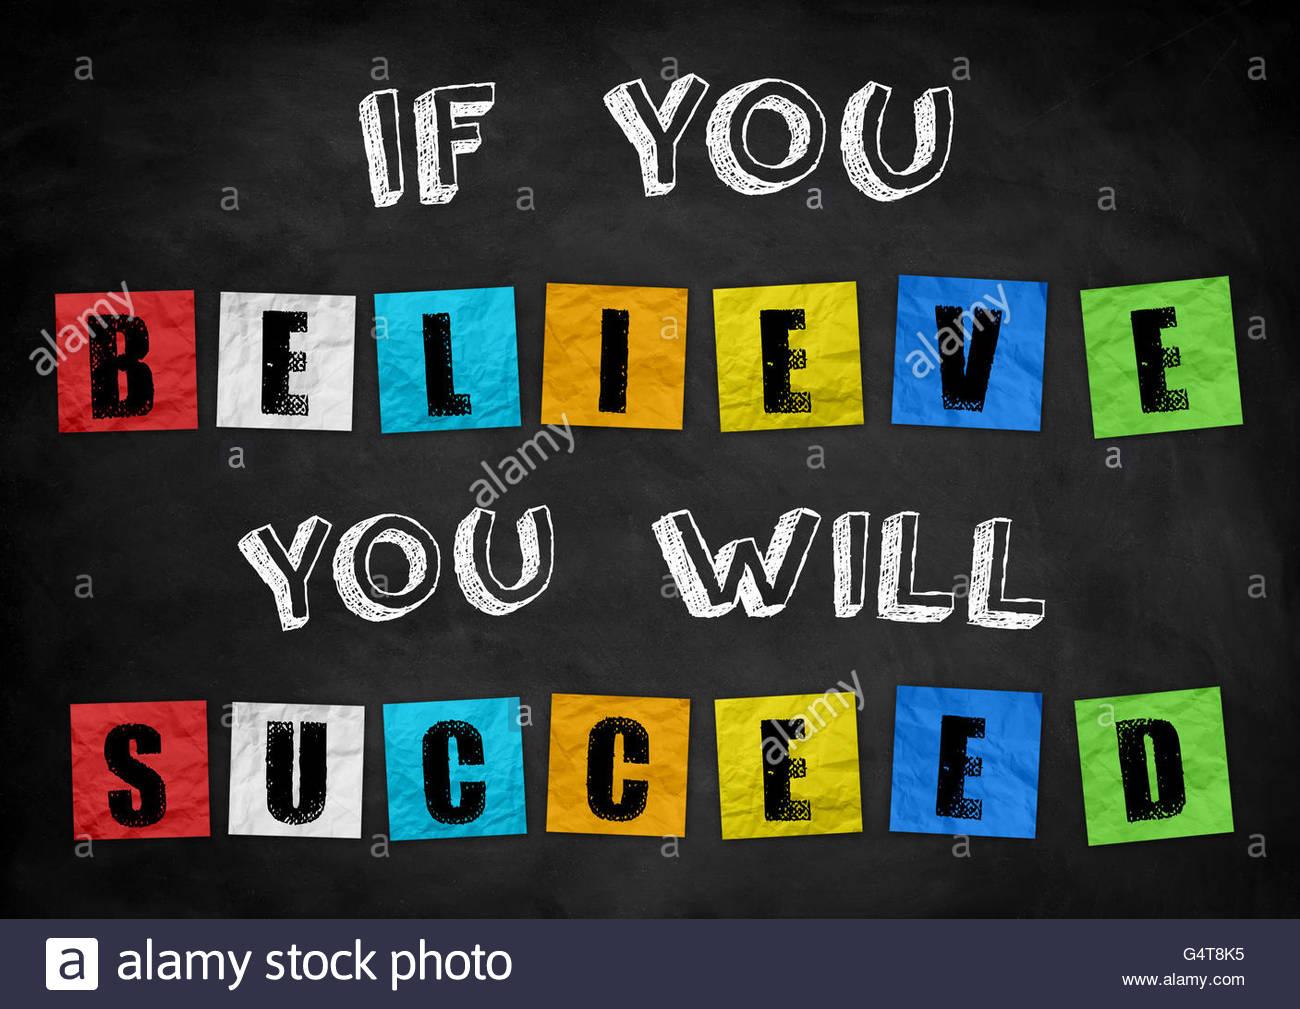 Si usted cree que usted tendrá éxito. Imagen De Stock